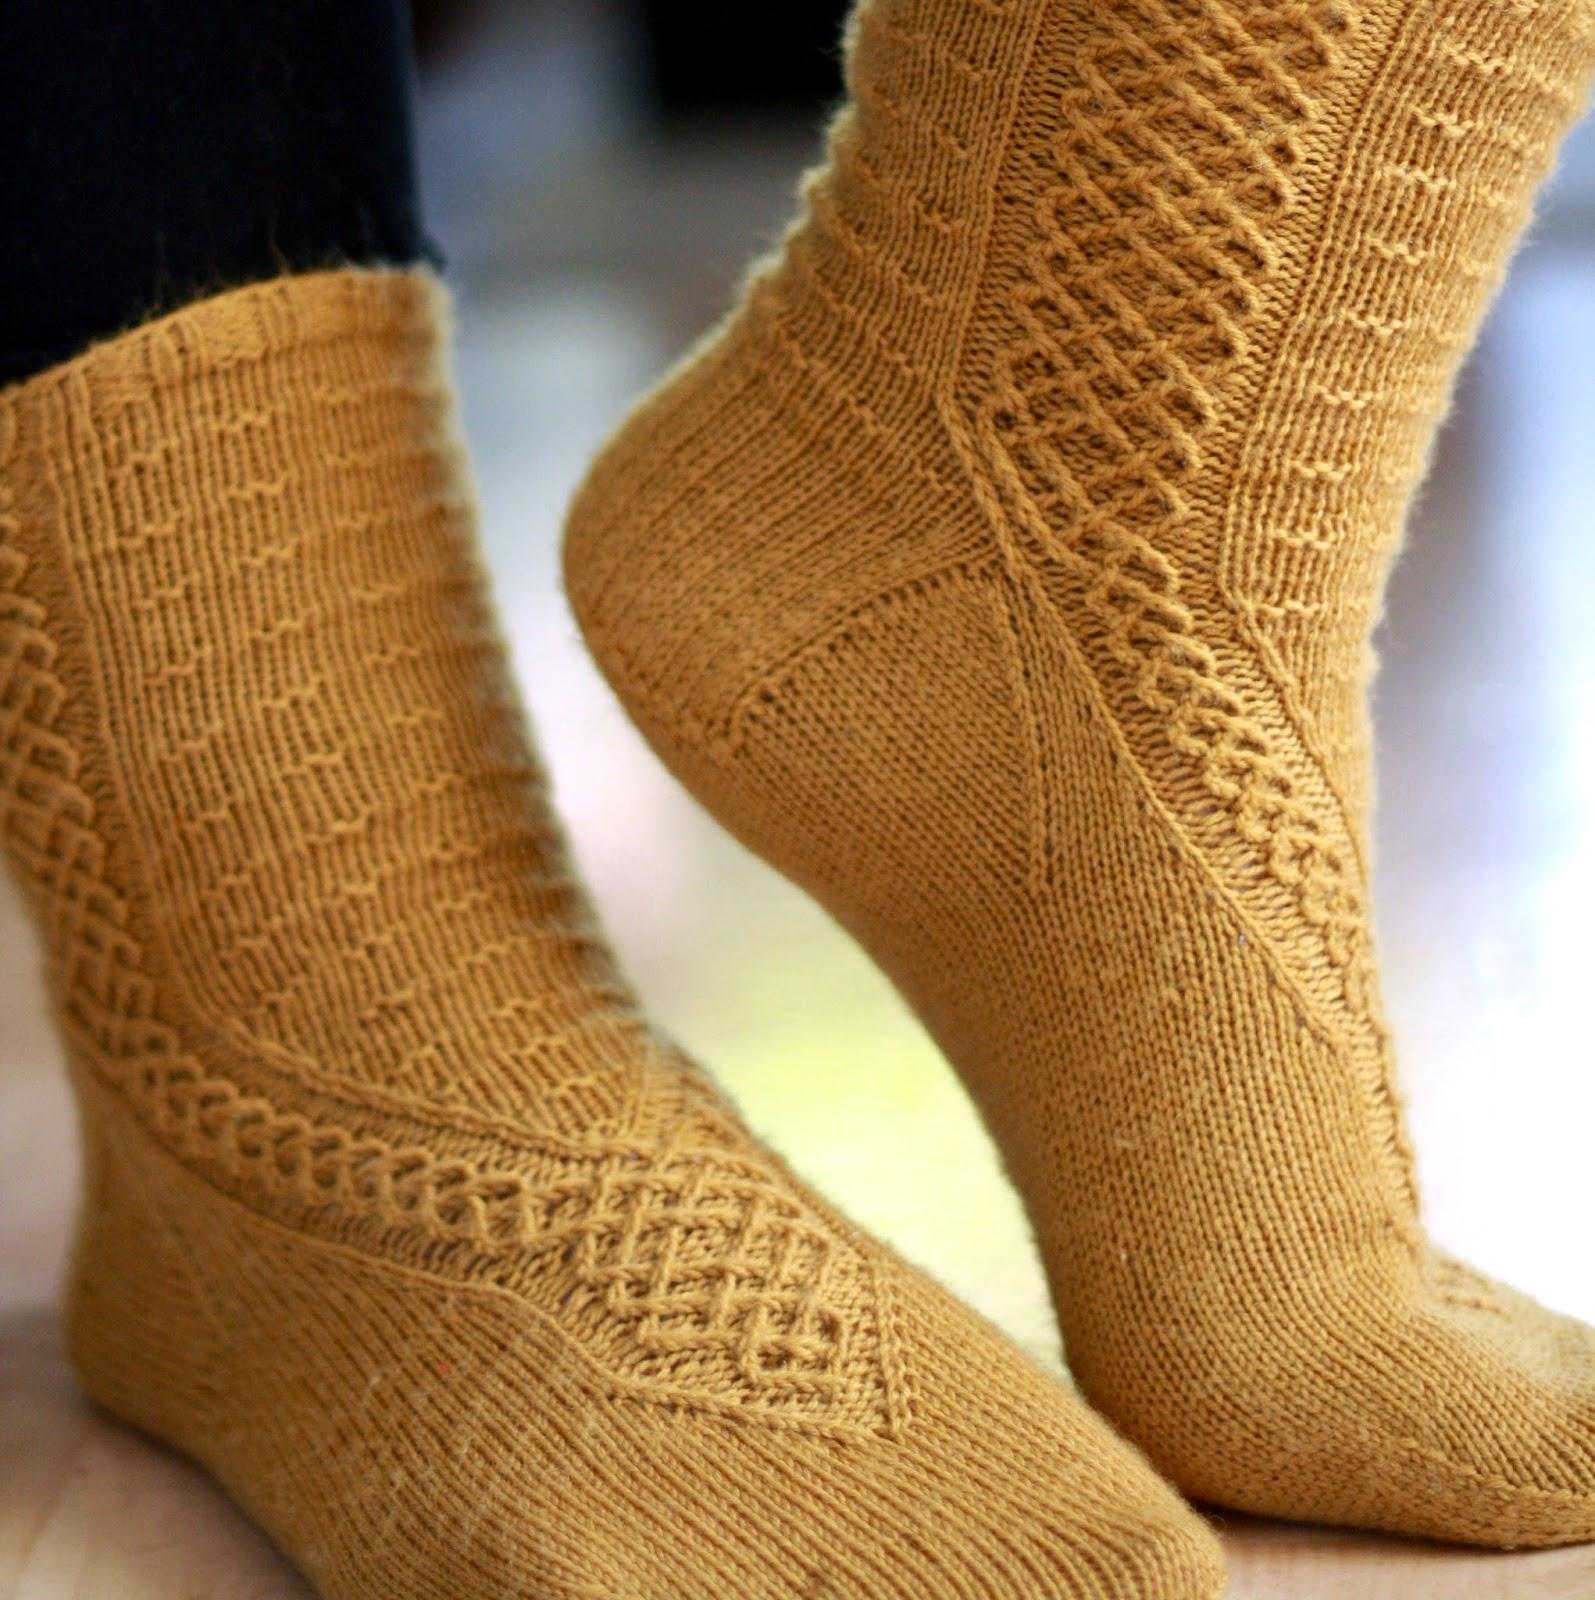 http://vihrealankablogi.blogspot.fi/2014/08/socks-of-elvenkind.html